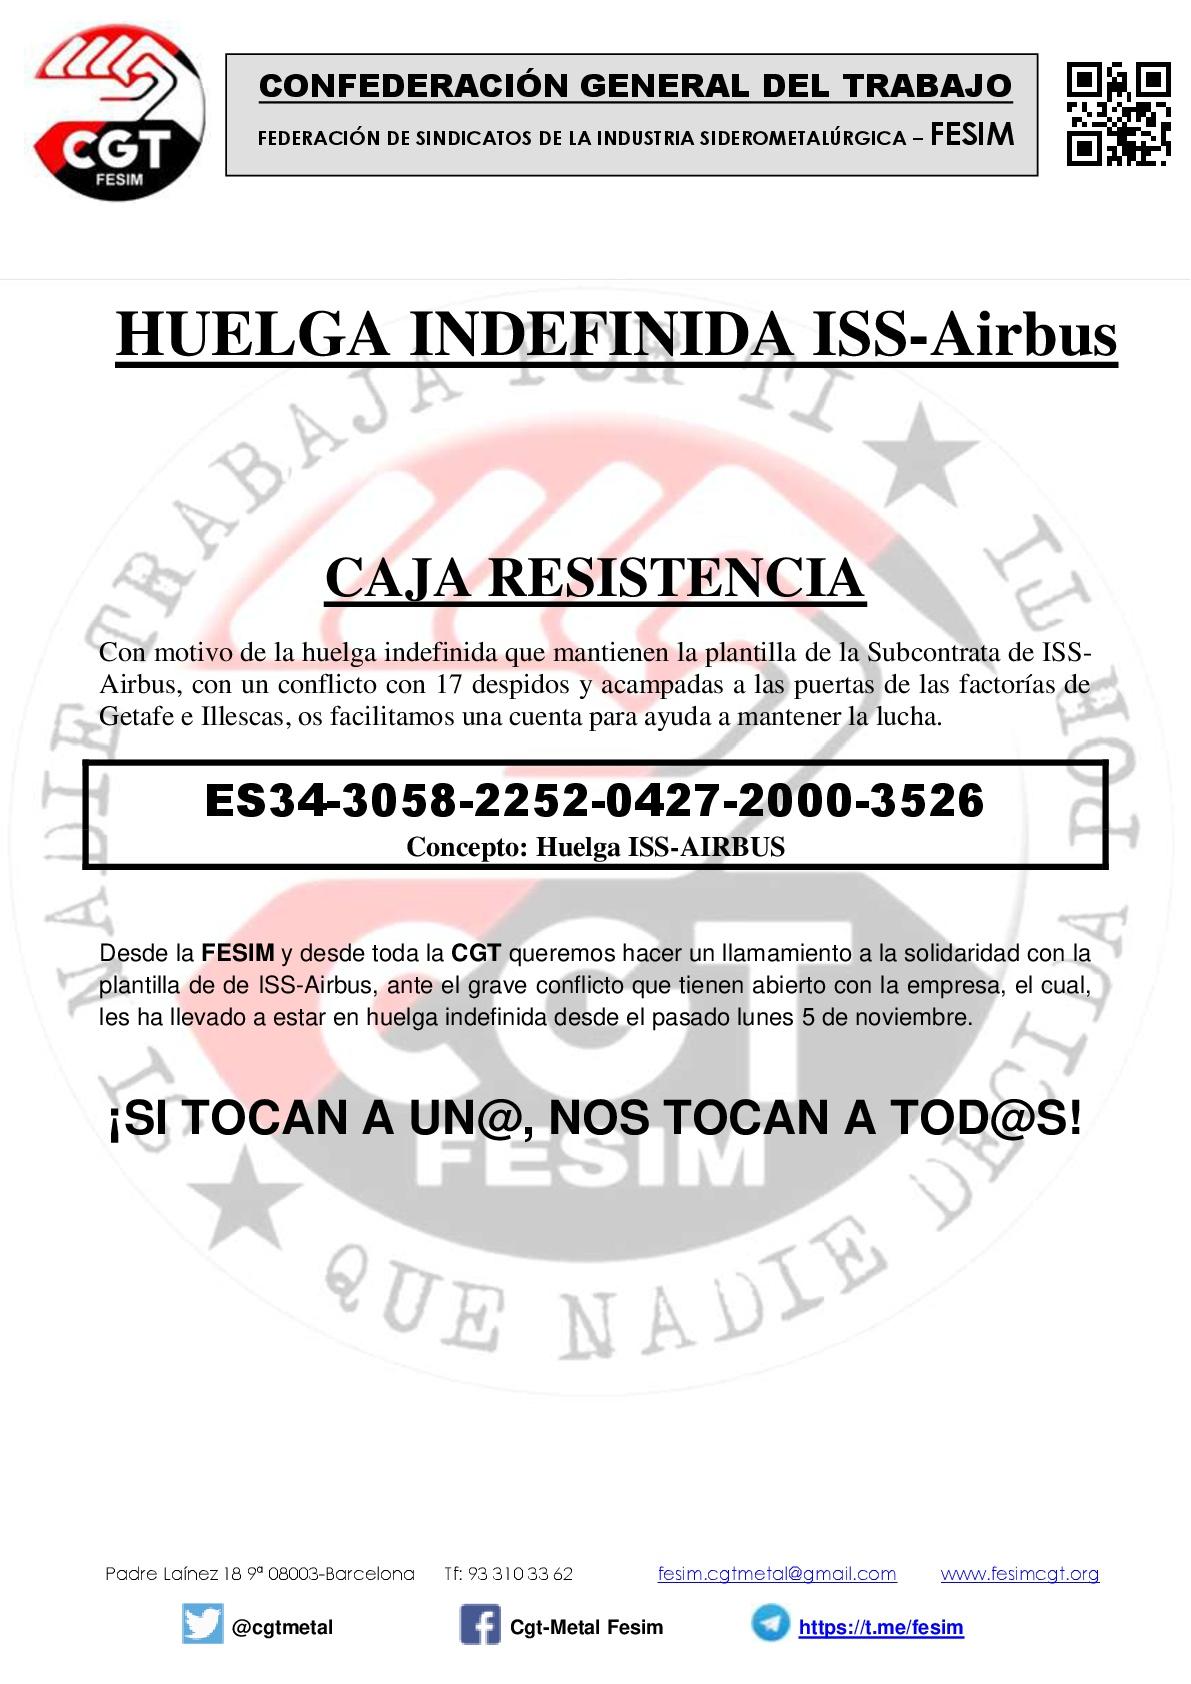 HUELGA ISS Airbus (caja de resistencia)-001